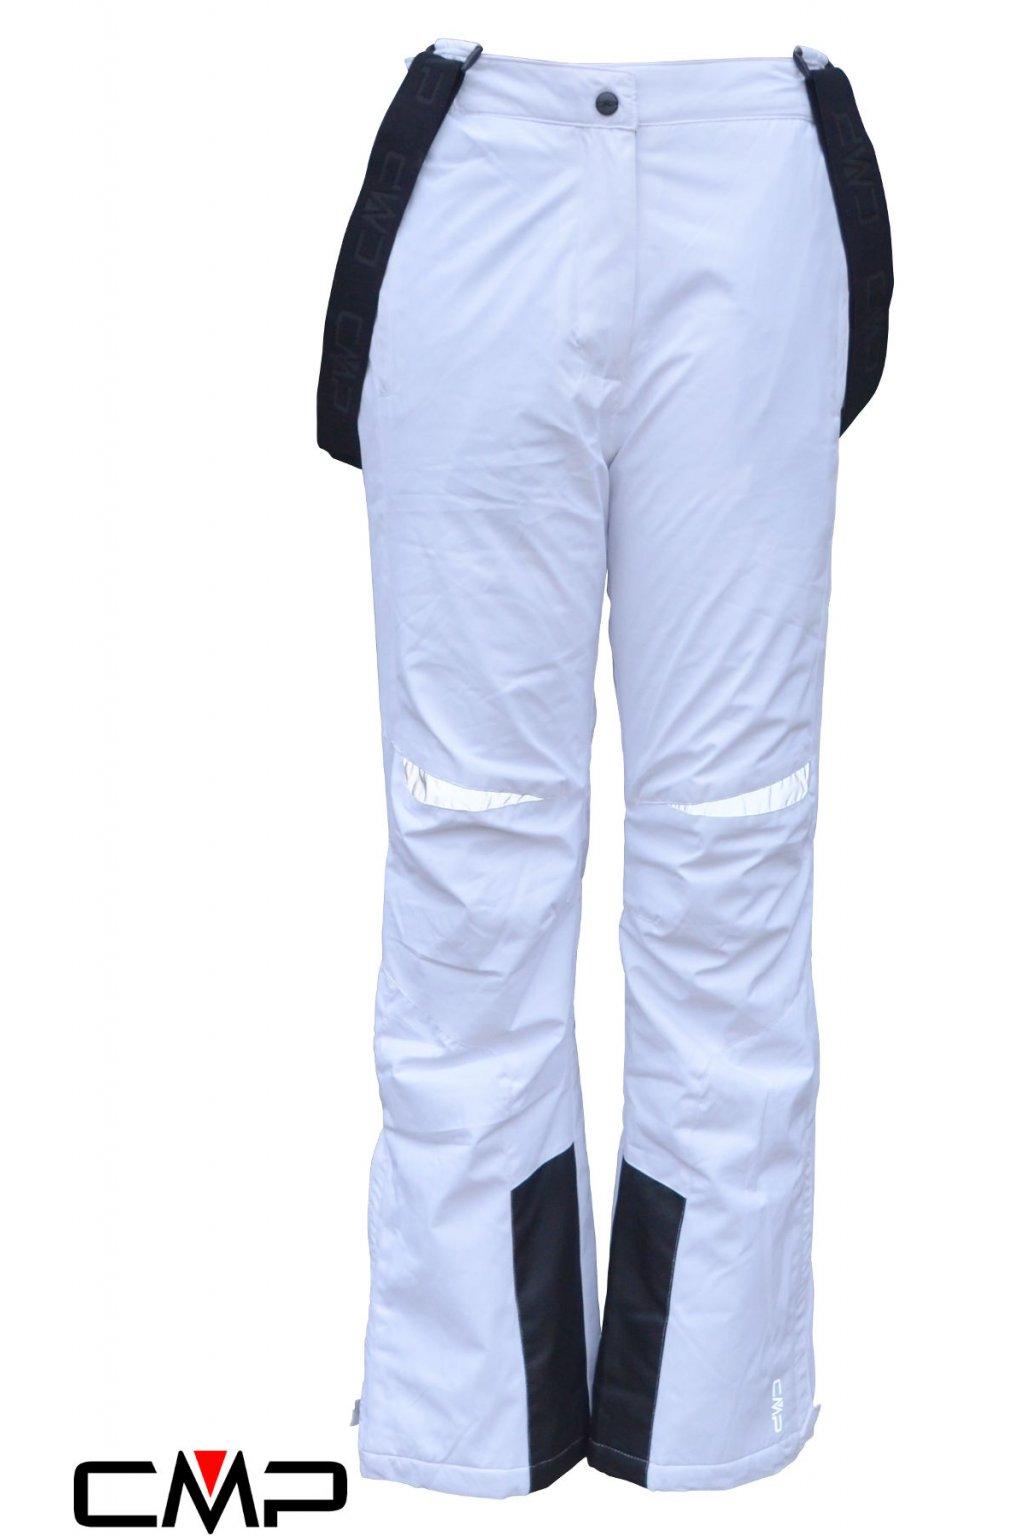 3w01805 a001 biele juniorske lyziarske nohavice mp ski salopette